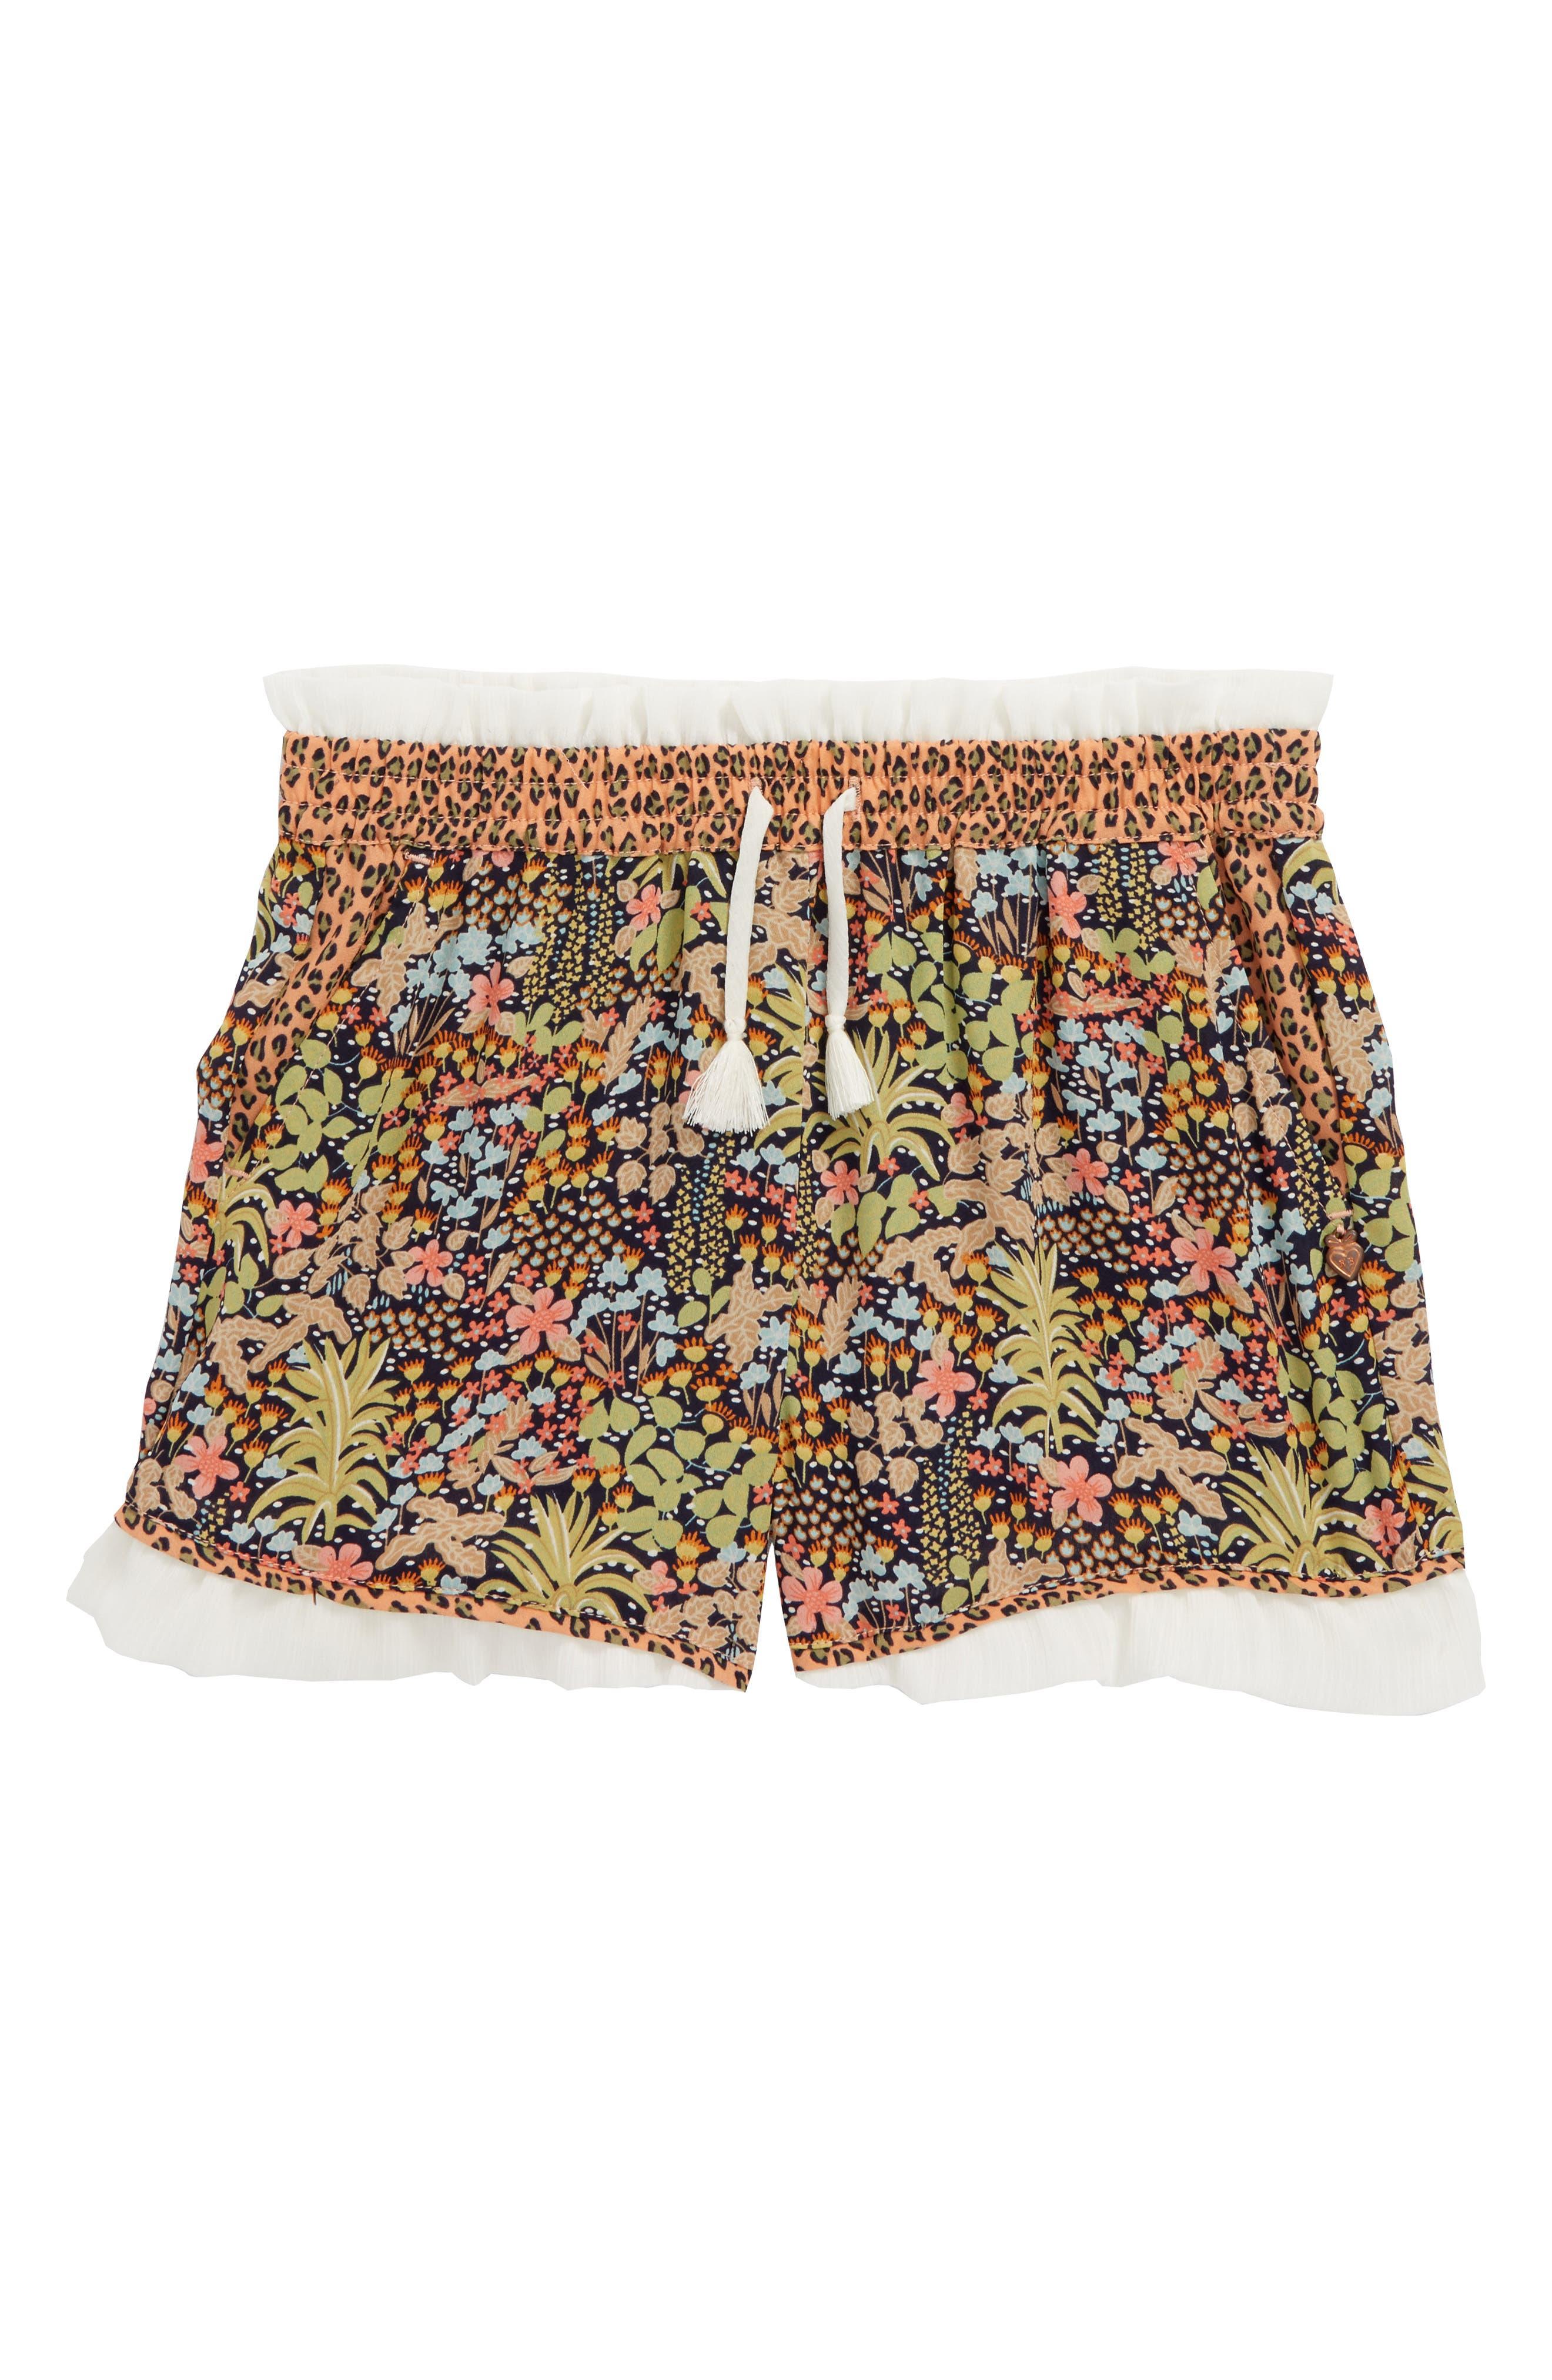 Jungle Print Shorts,                         Main,                         color, 950